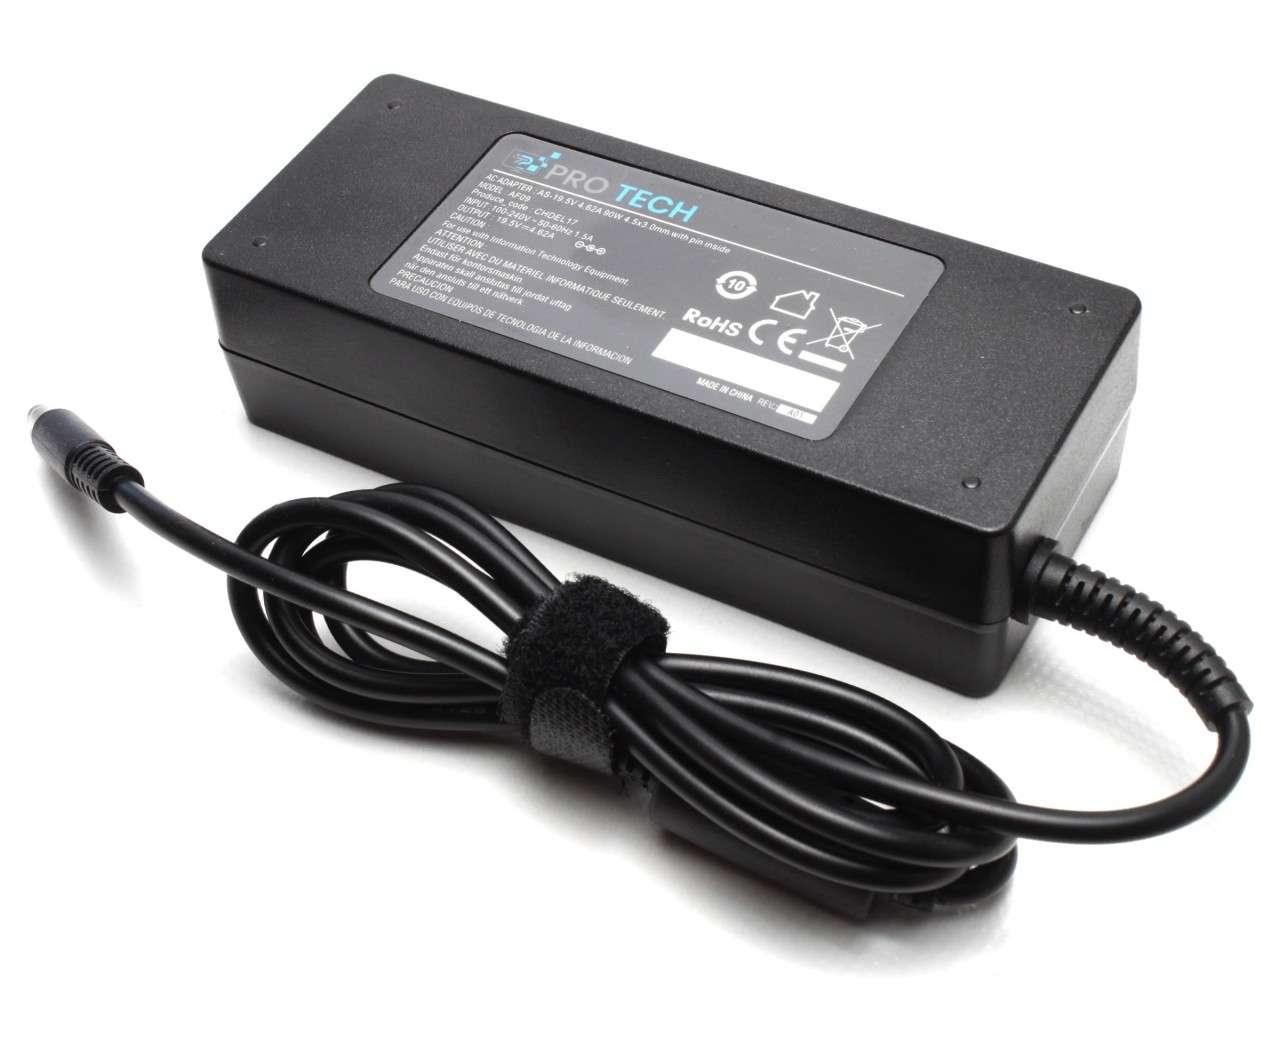 Incarcator Dell Inspiron 13 7347 90W Replacement imagine powerlaptop.ro 2021